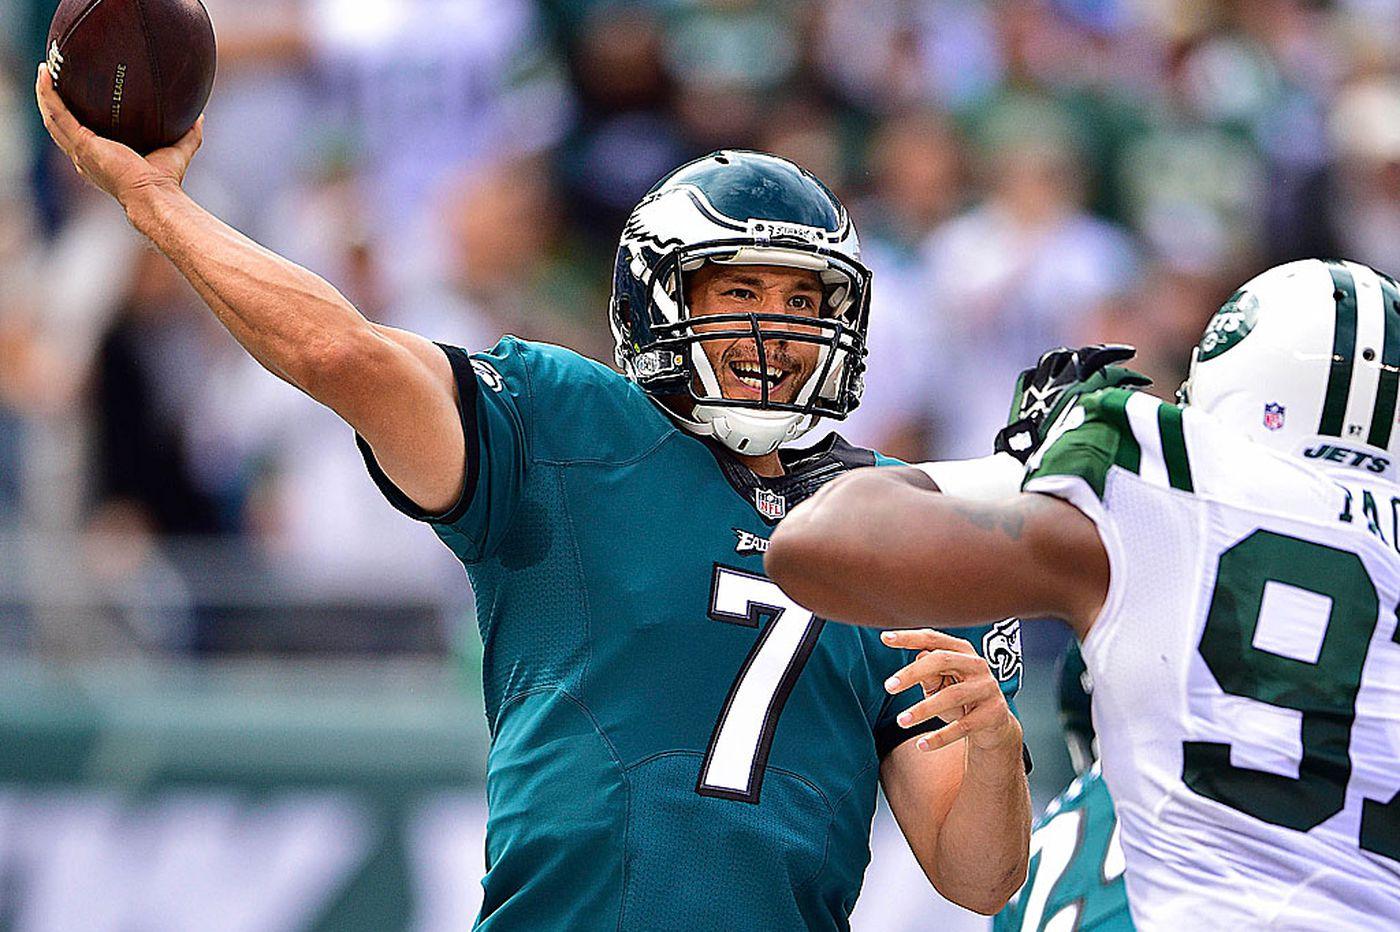 Eagles' Sam Bradford: Longball will come to pass